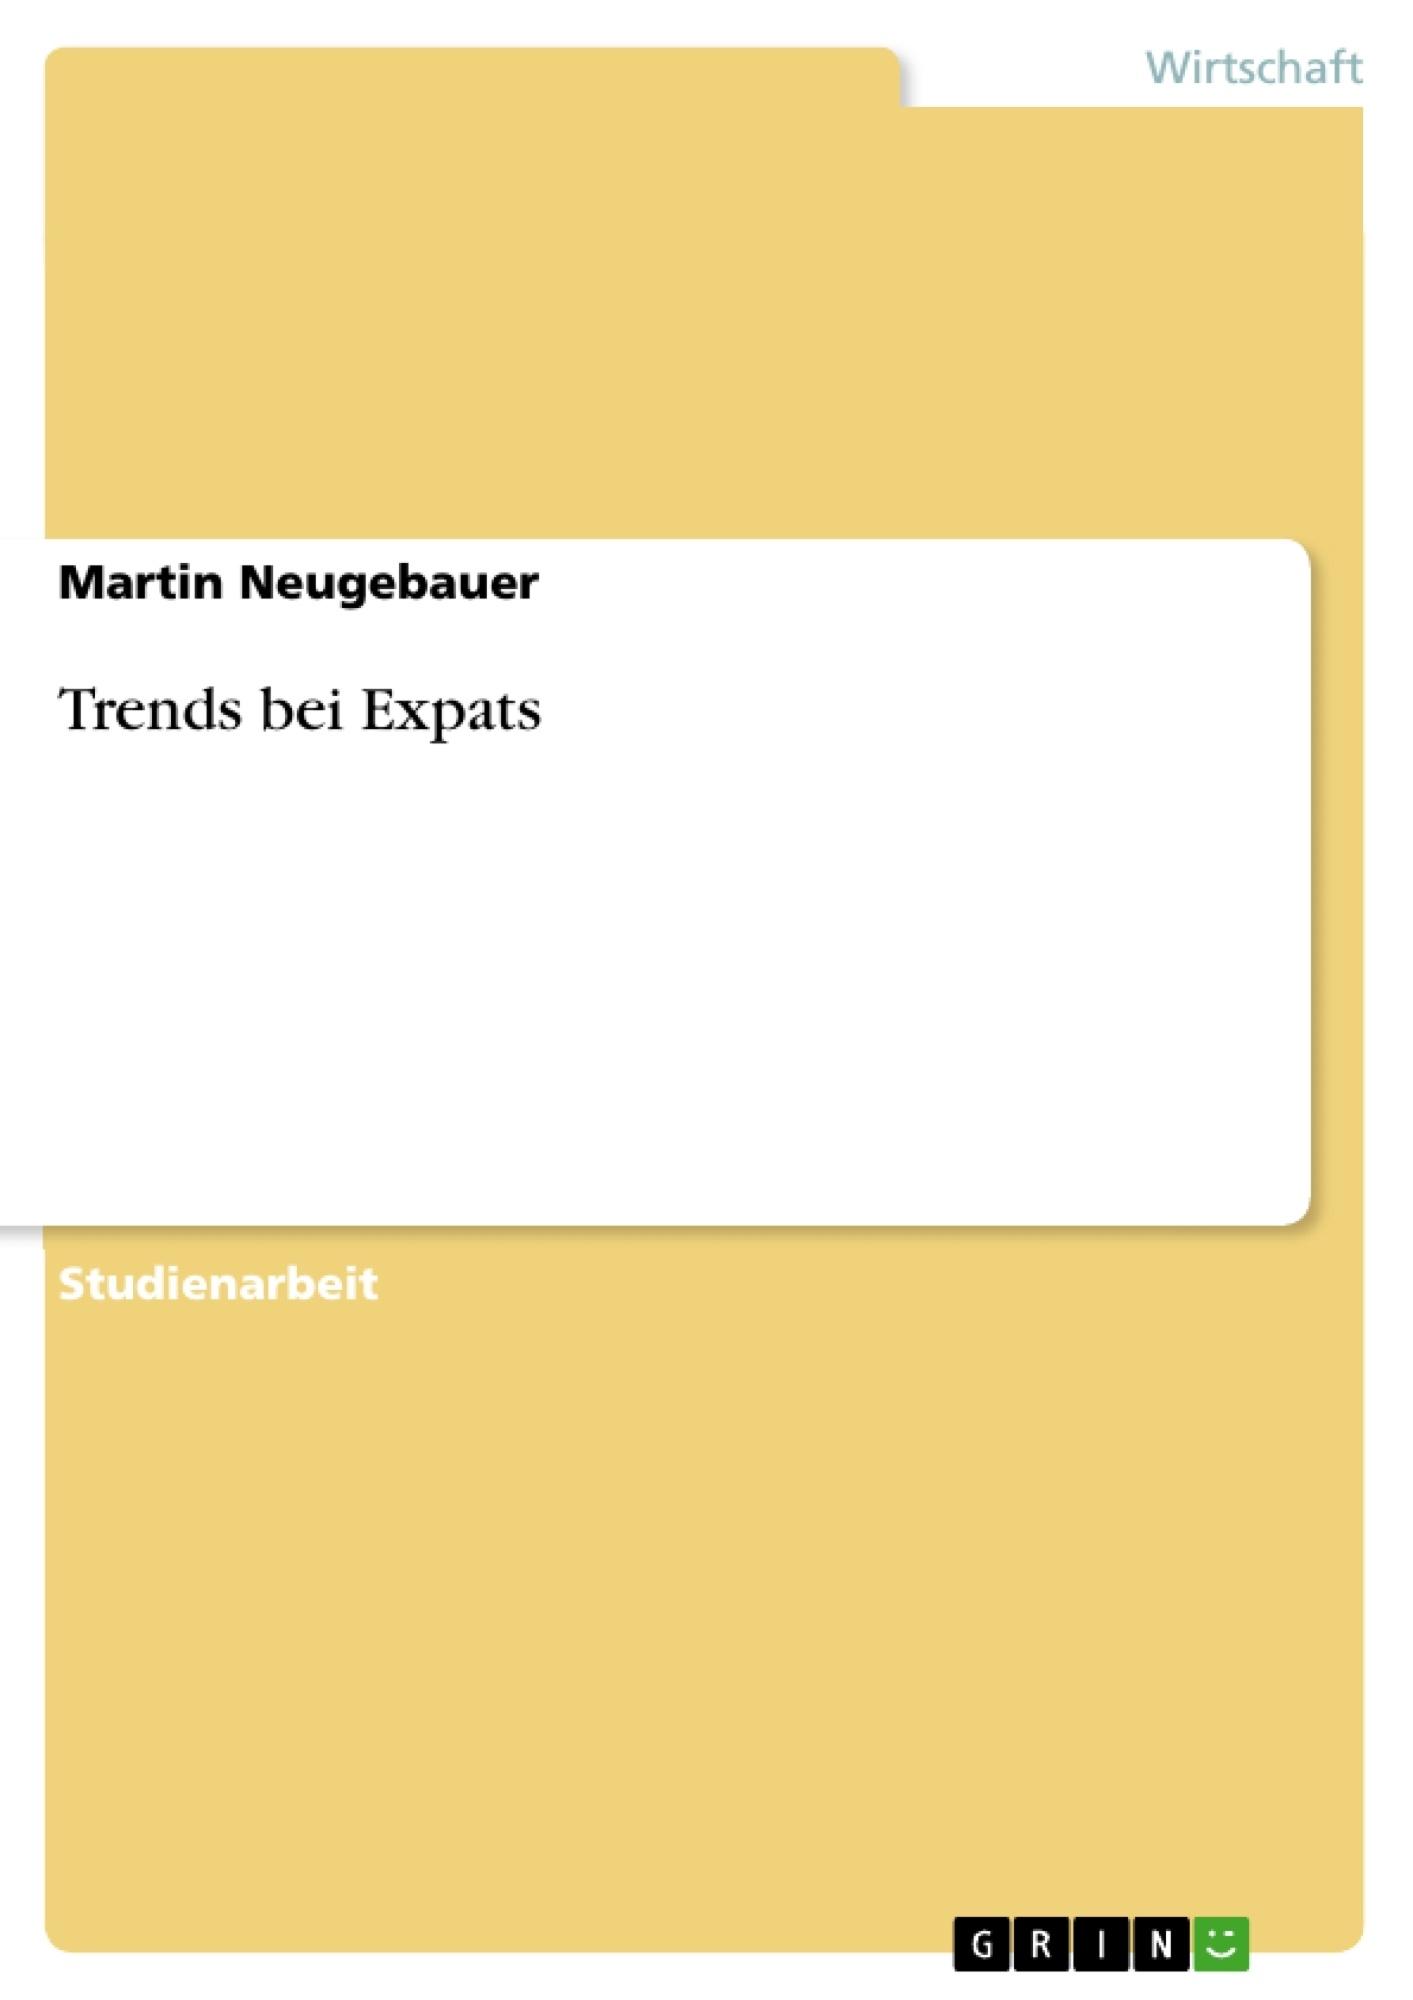 Titel: Trends bei Expats